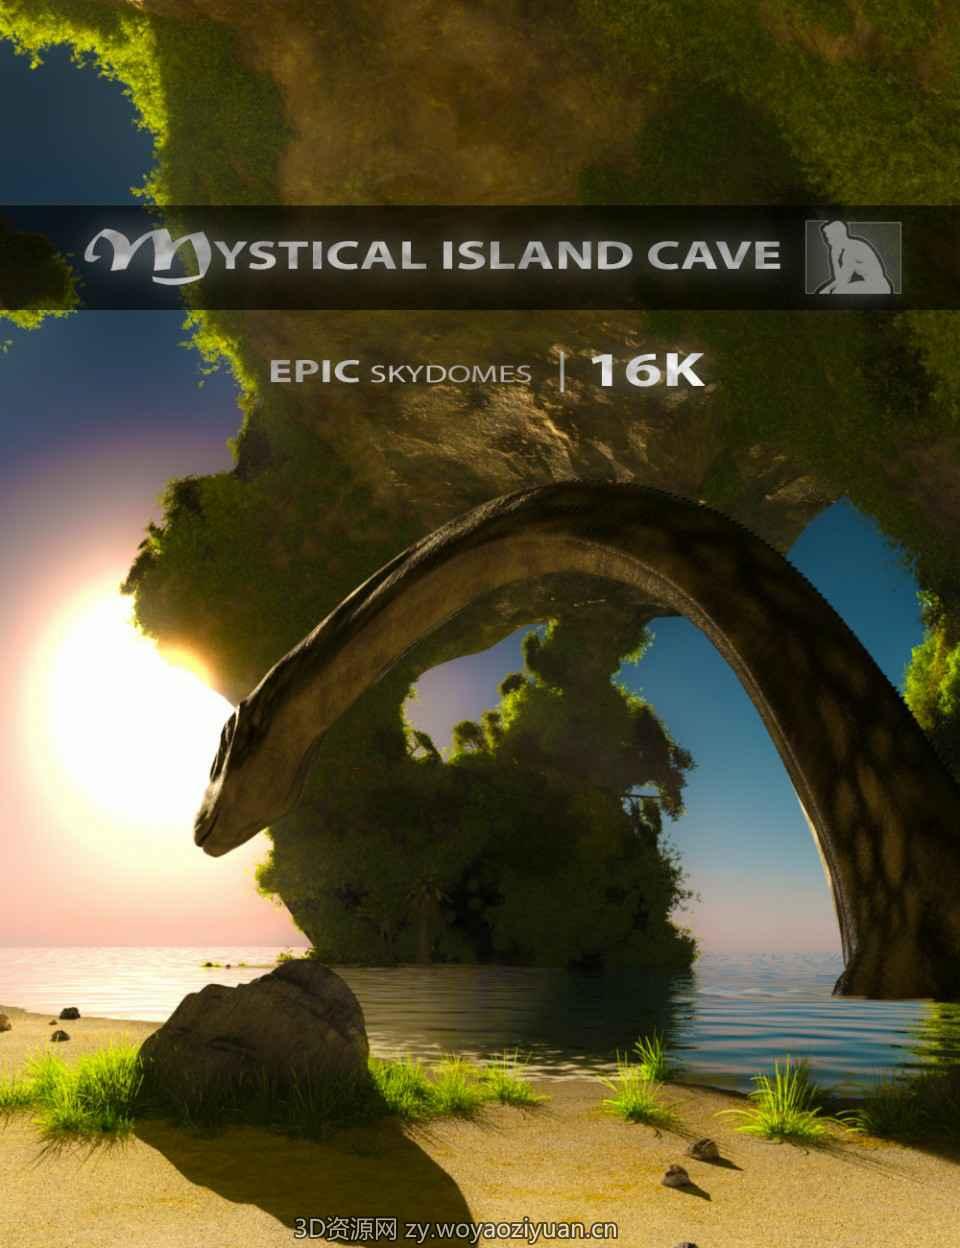 Epic Skydomes Mystical Island Cave 16K HDRI